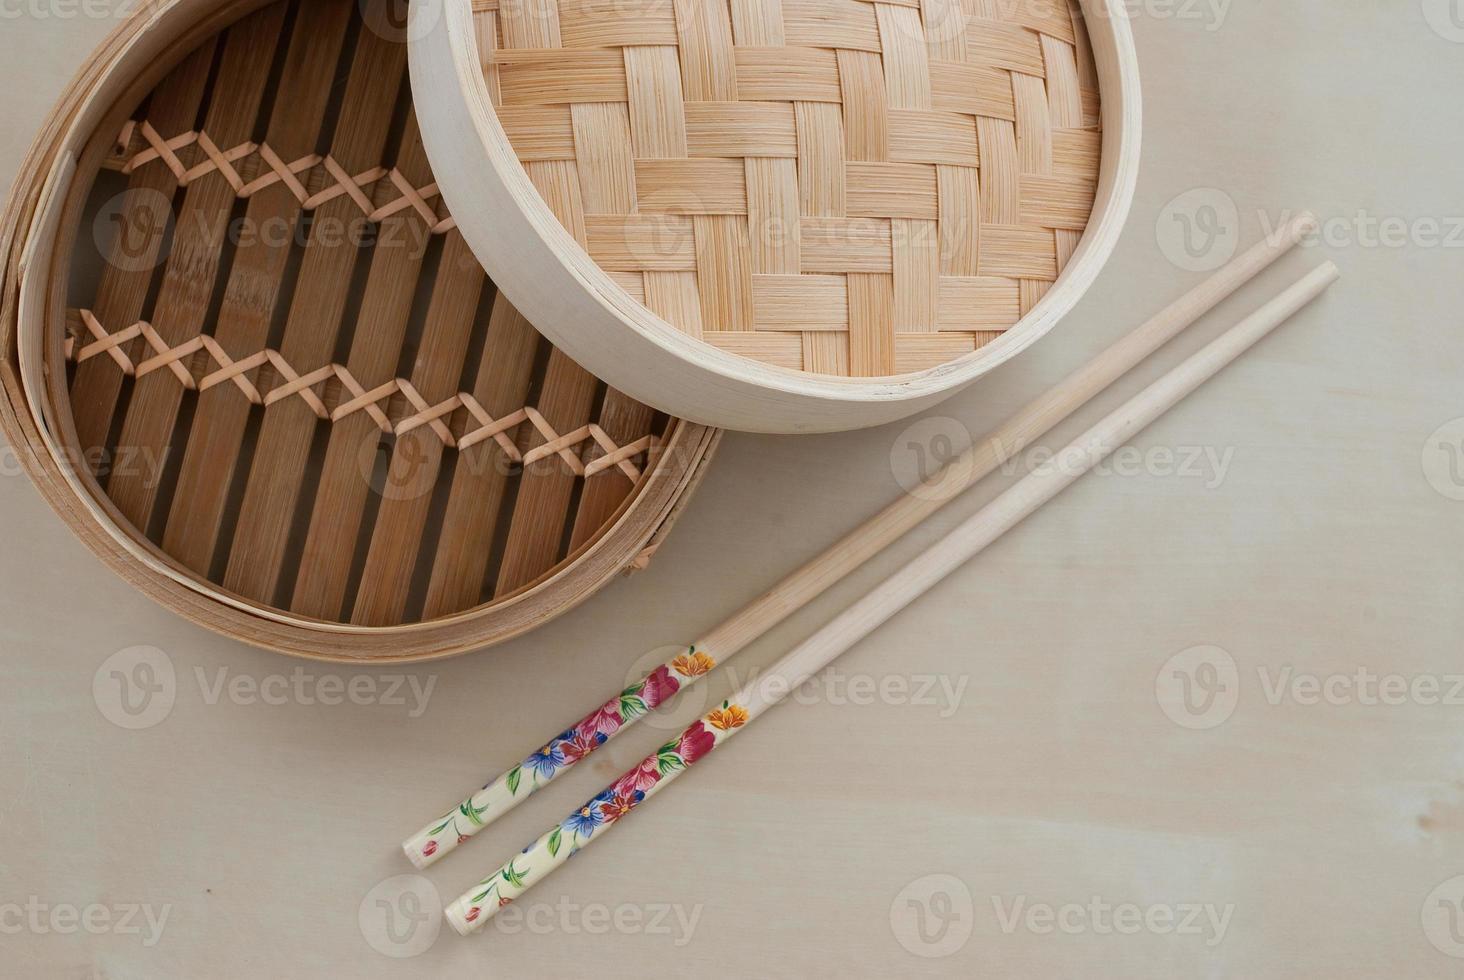 traditionele bamboe stoomboot foto